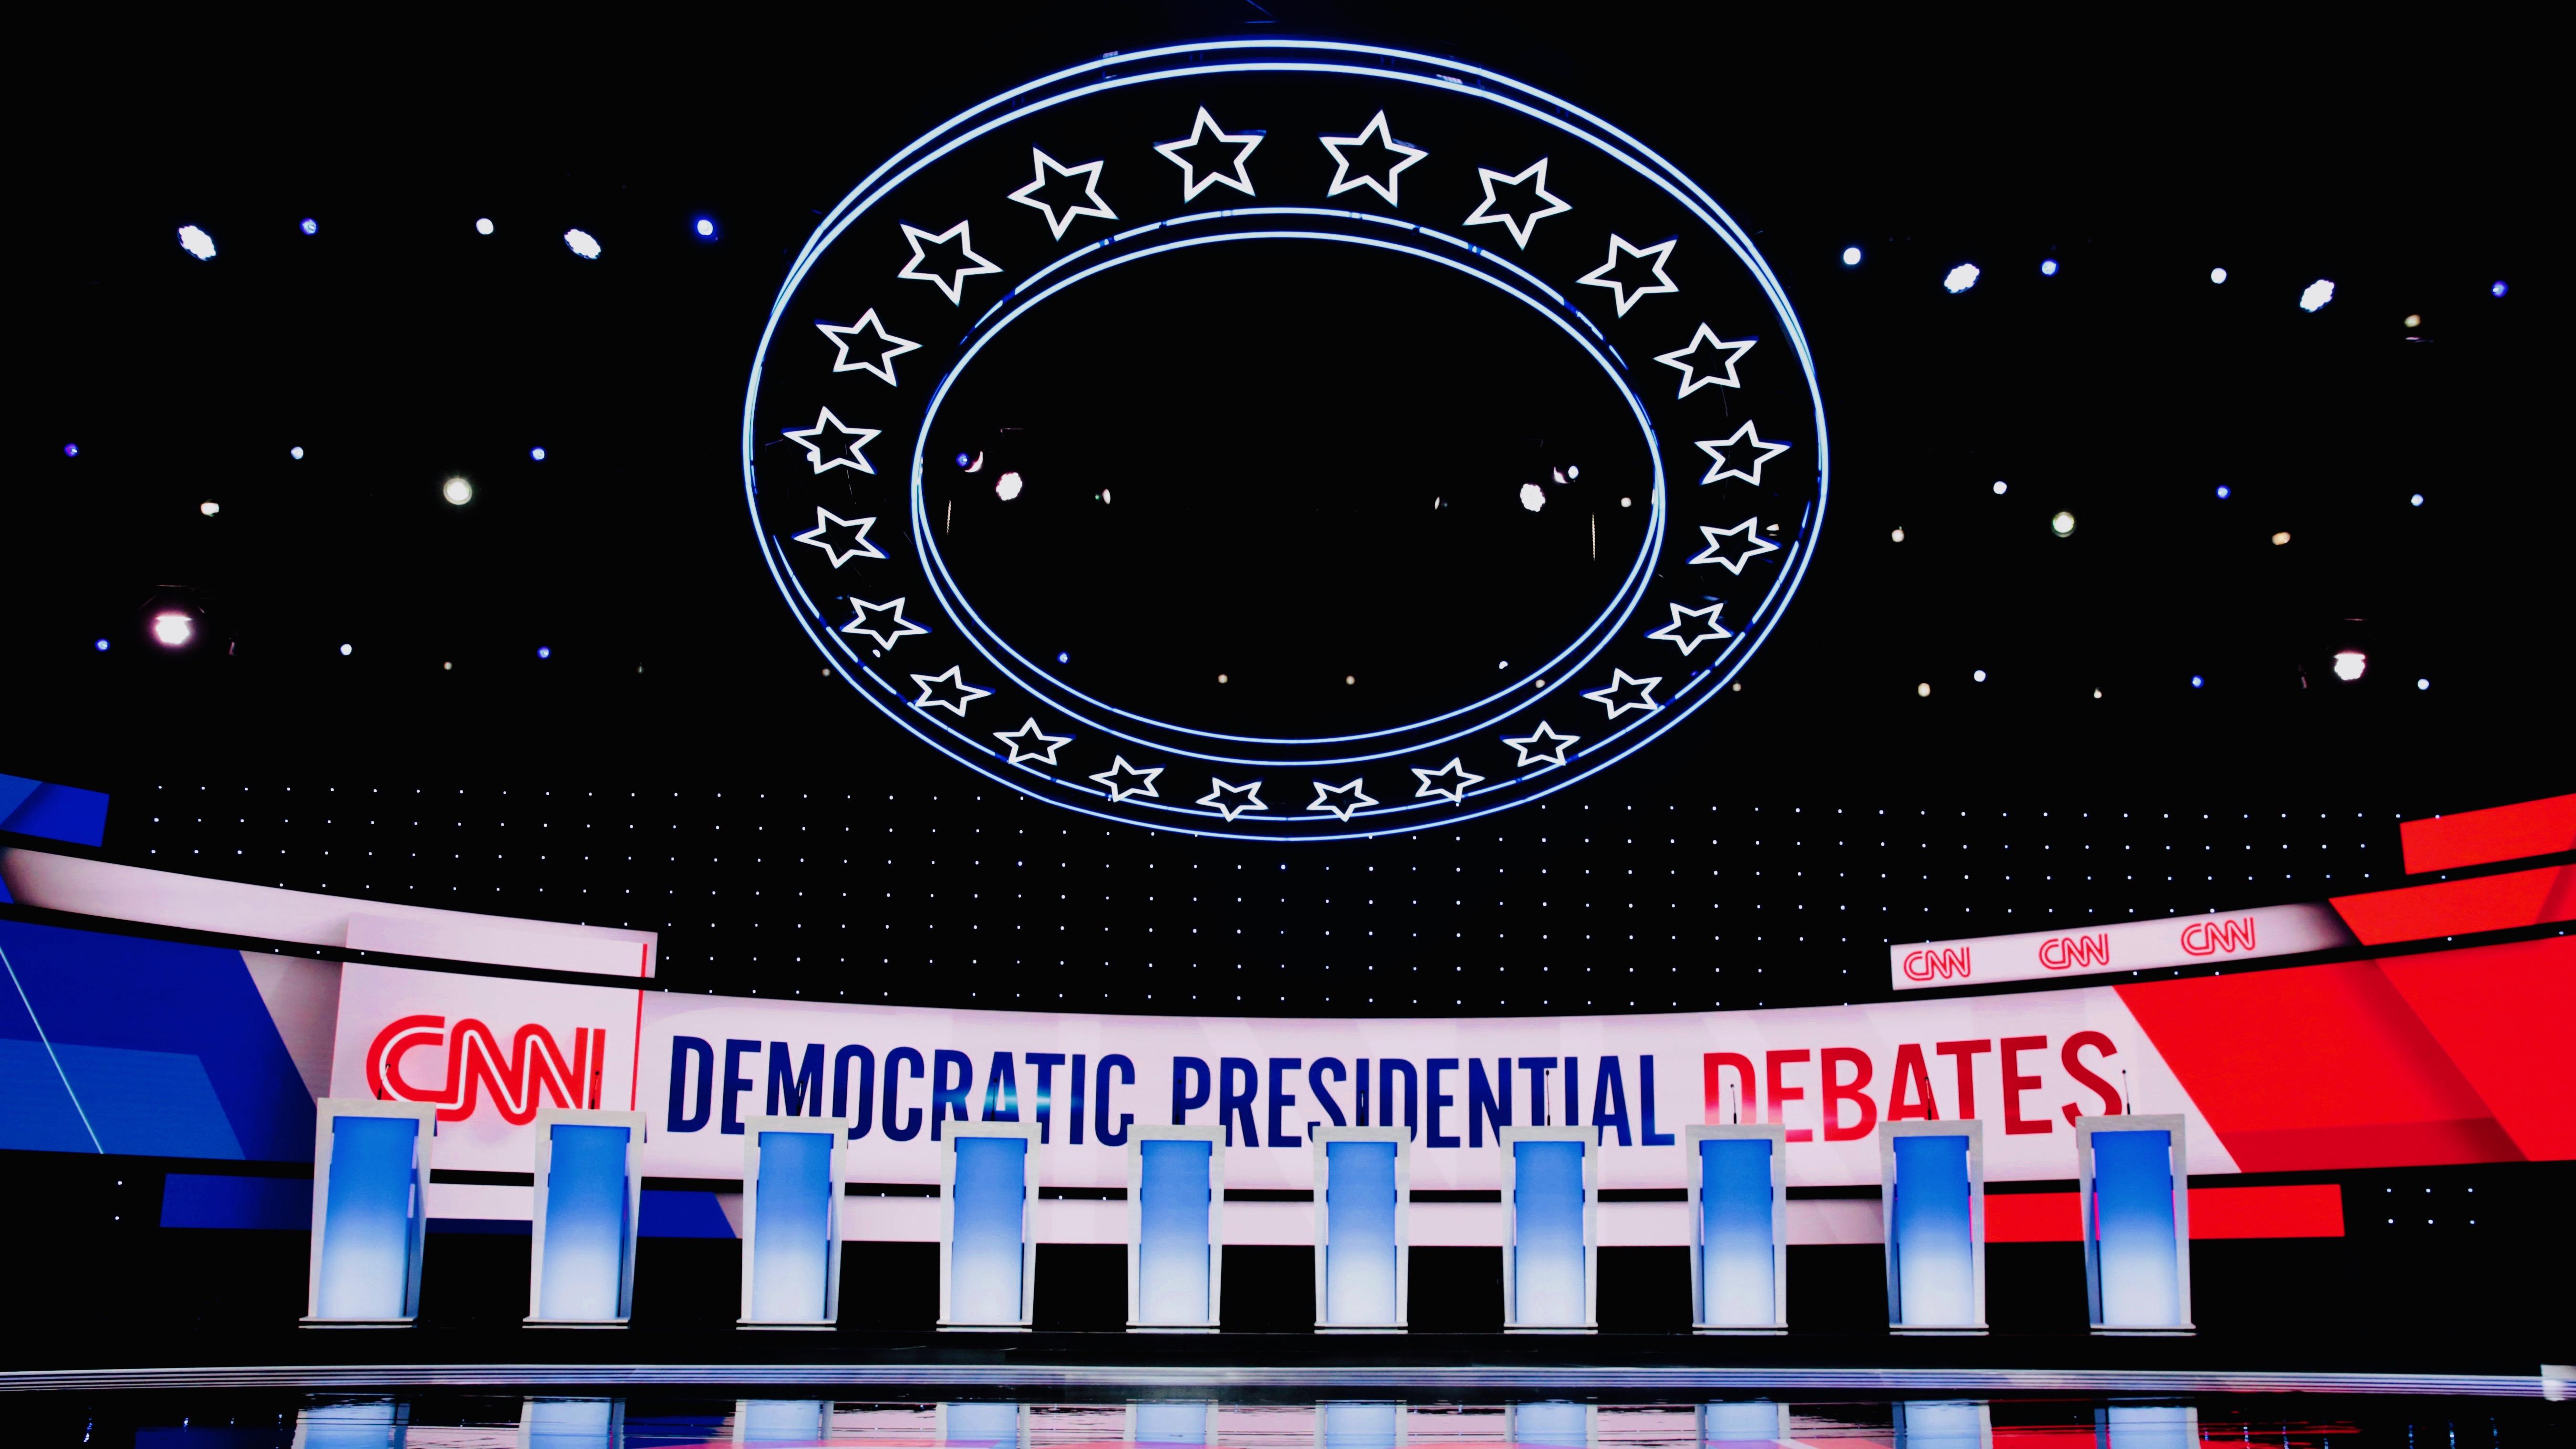 The debate stage.